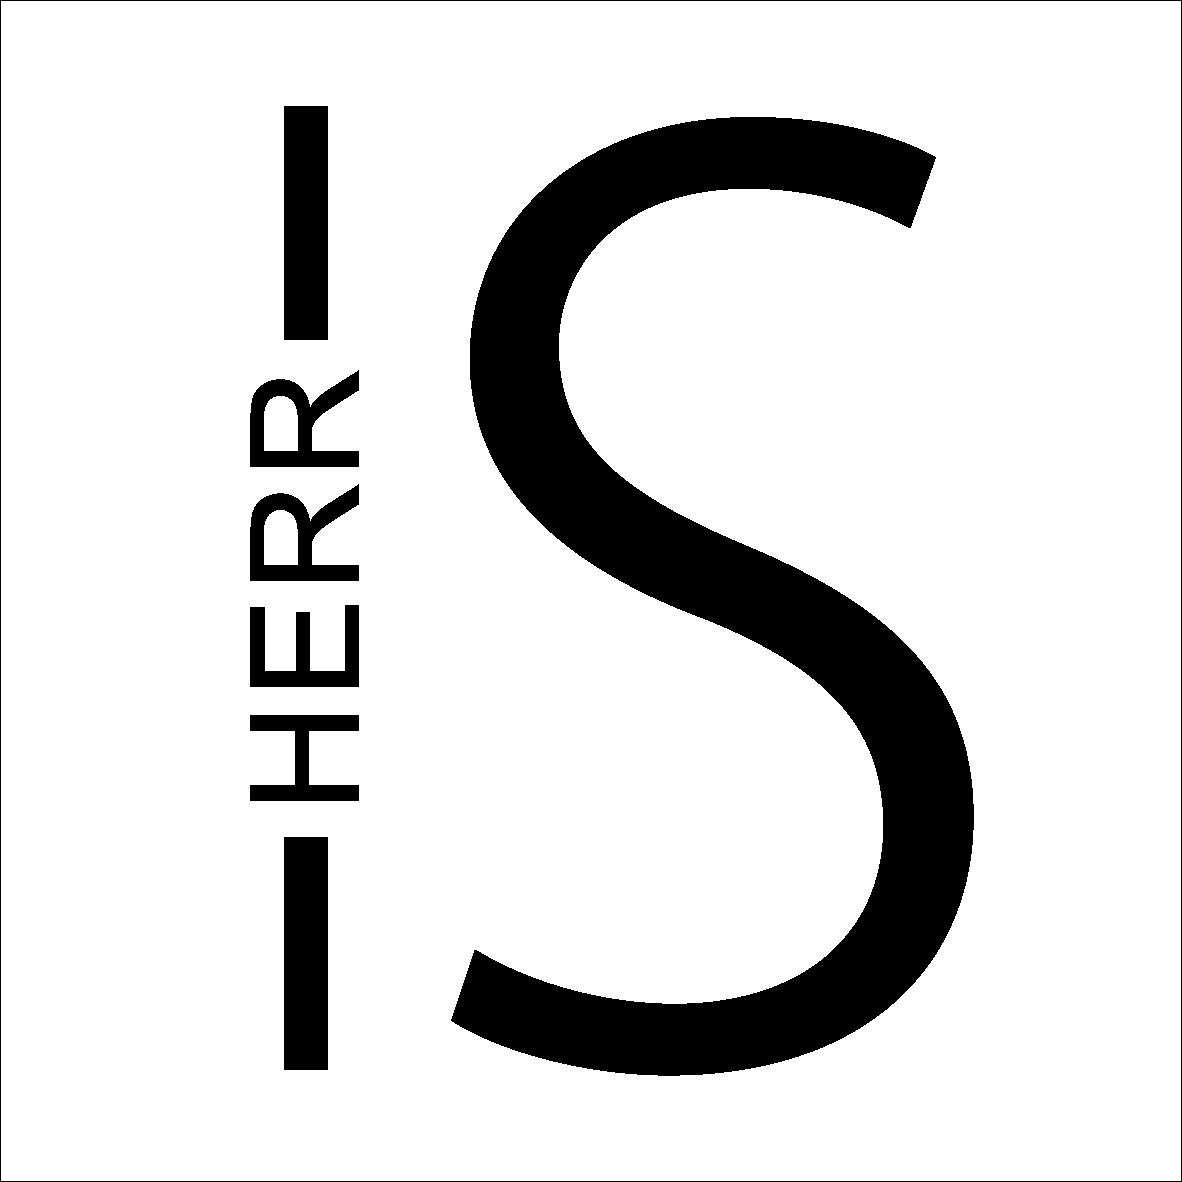 Herr Siegfried Logo Q